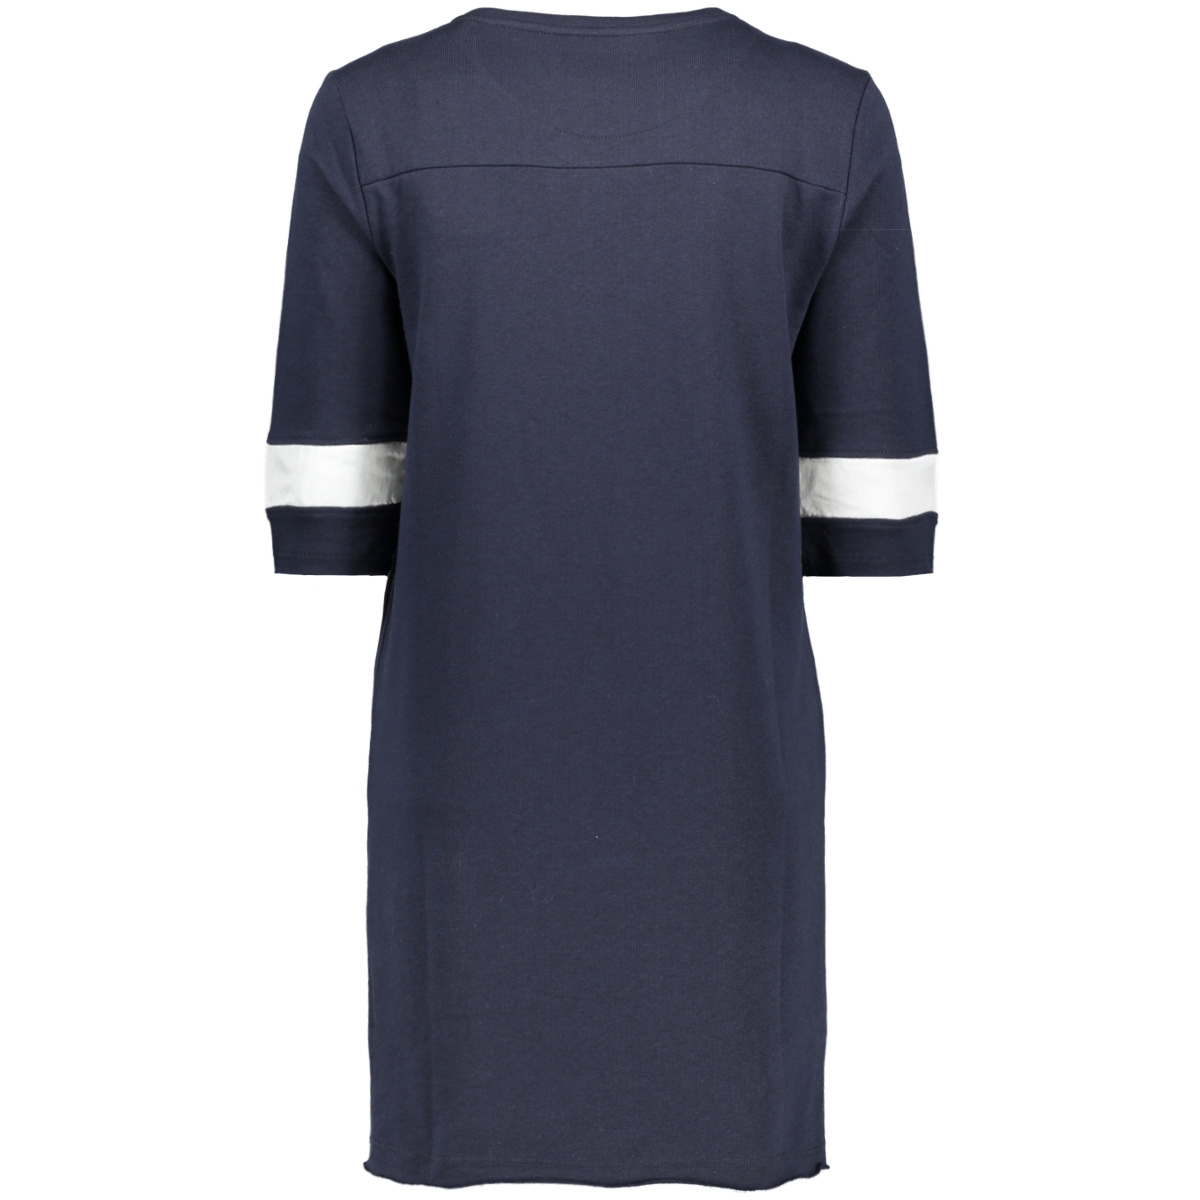 onlline 2/4 dress swt 15142078 only jurk sky captain/cloud dancer